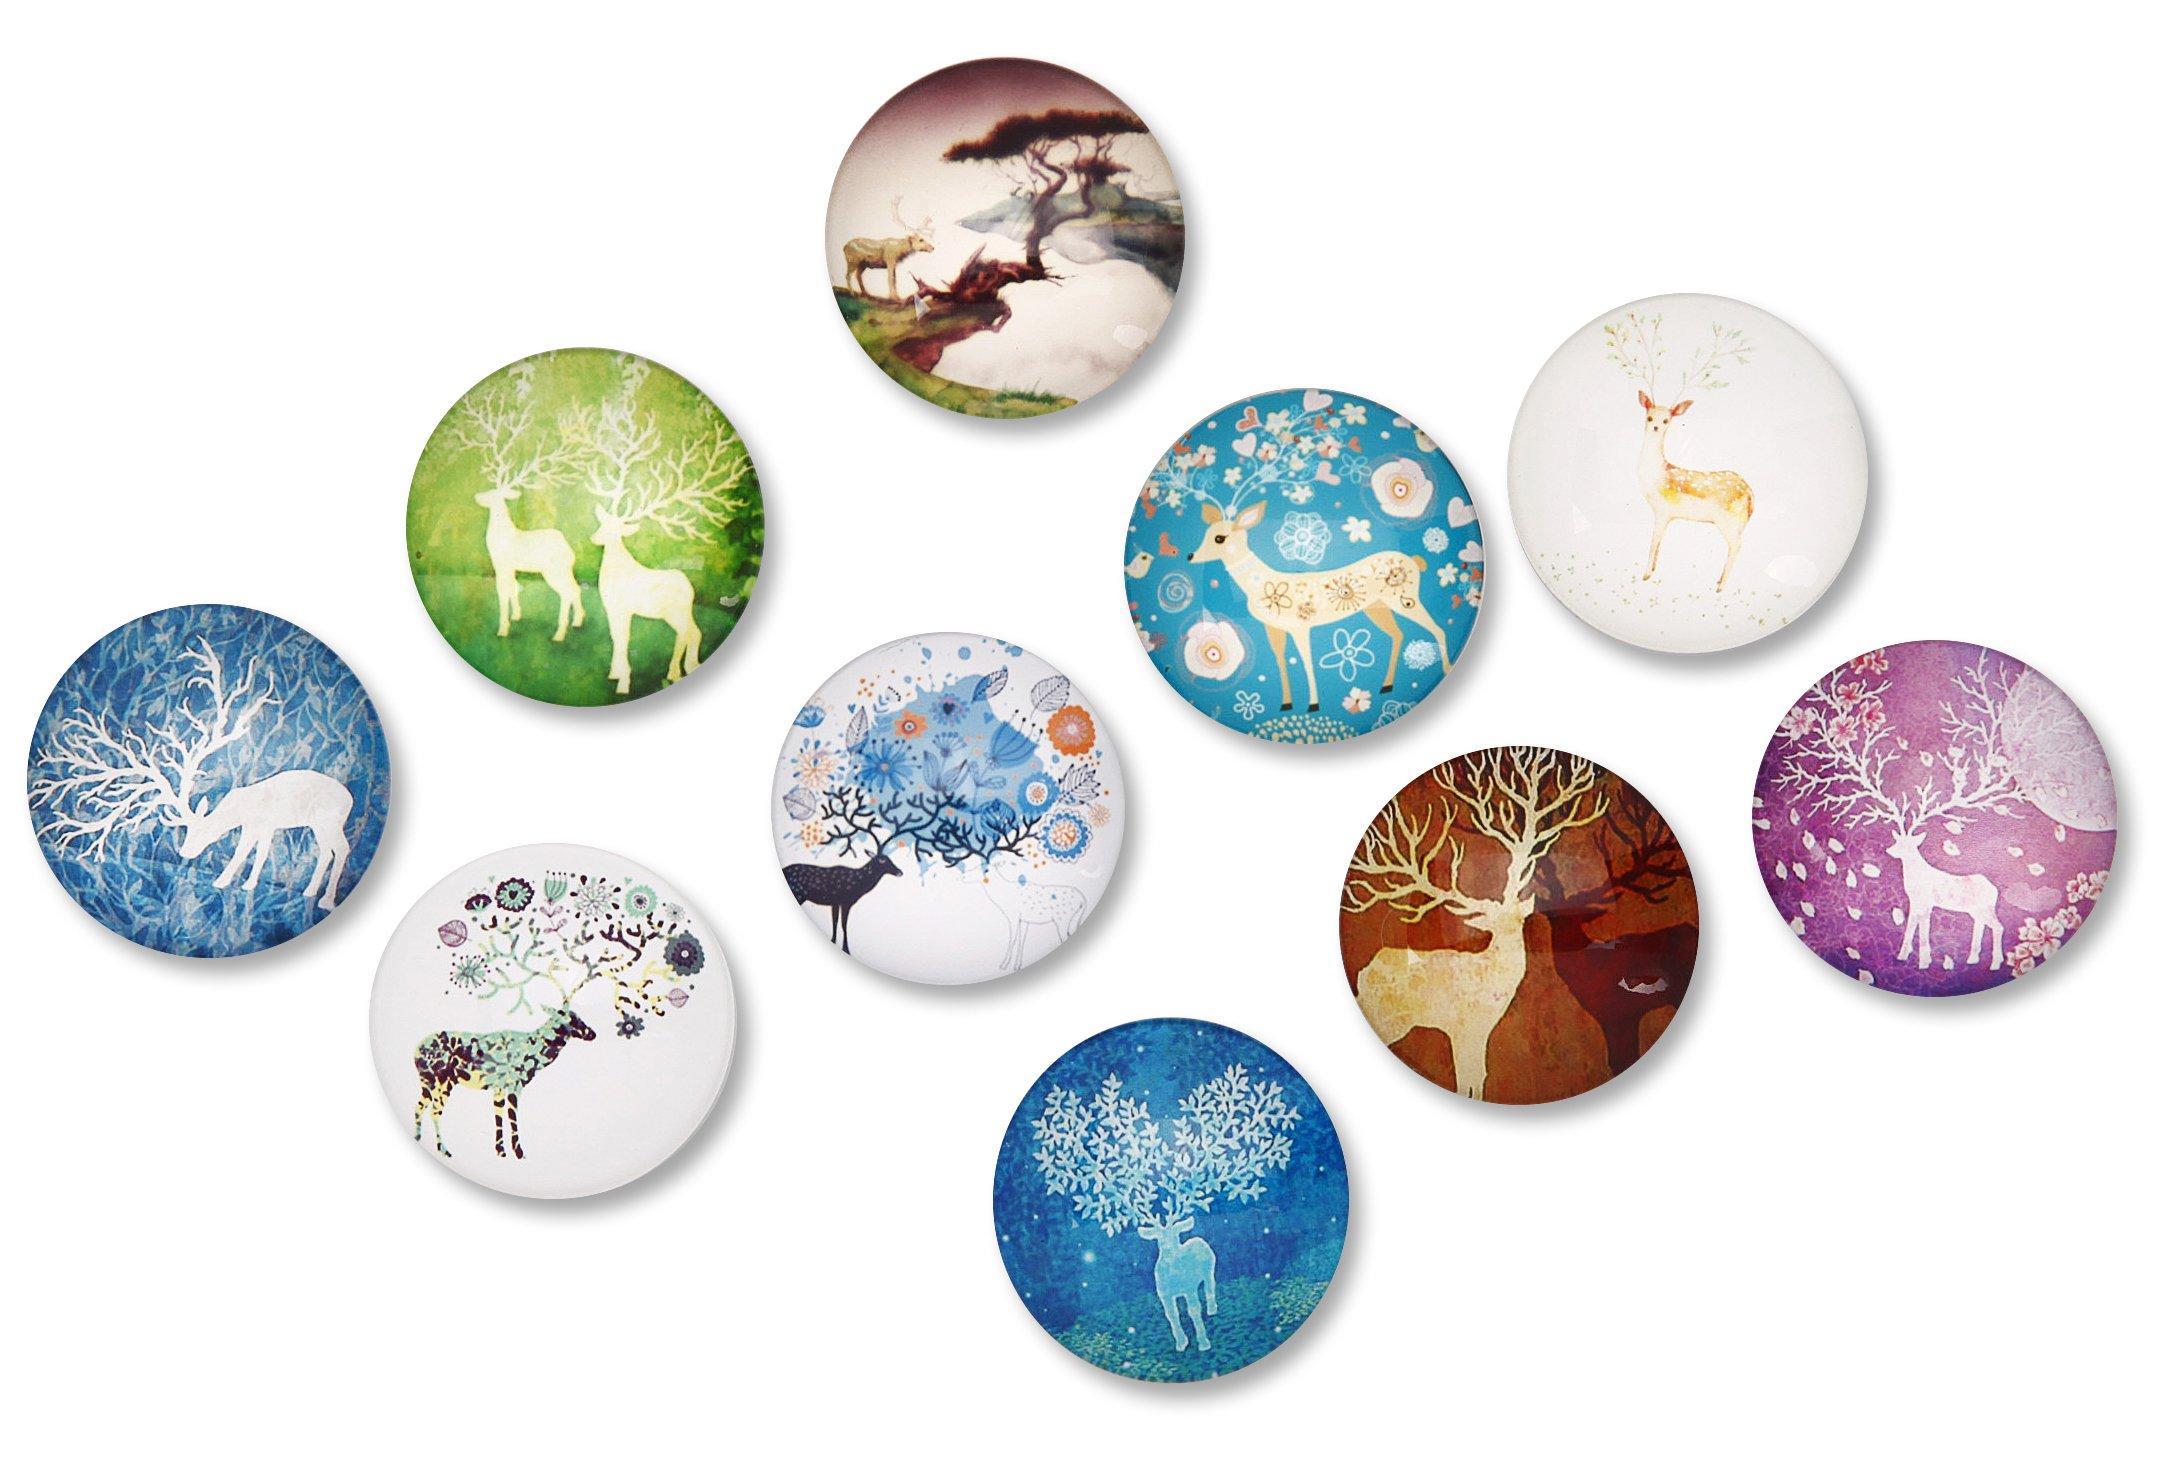 FF Elaine 10 Pcs Fridge Magnets Crystal Glass Housewarming Home Decorations Gift (Elk)